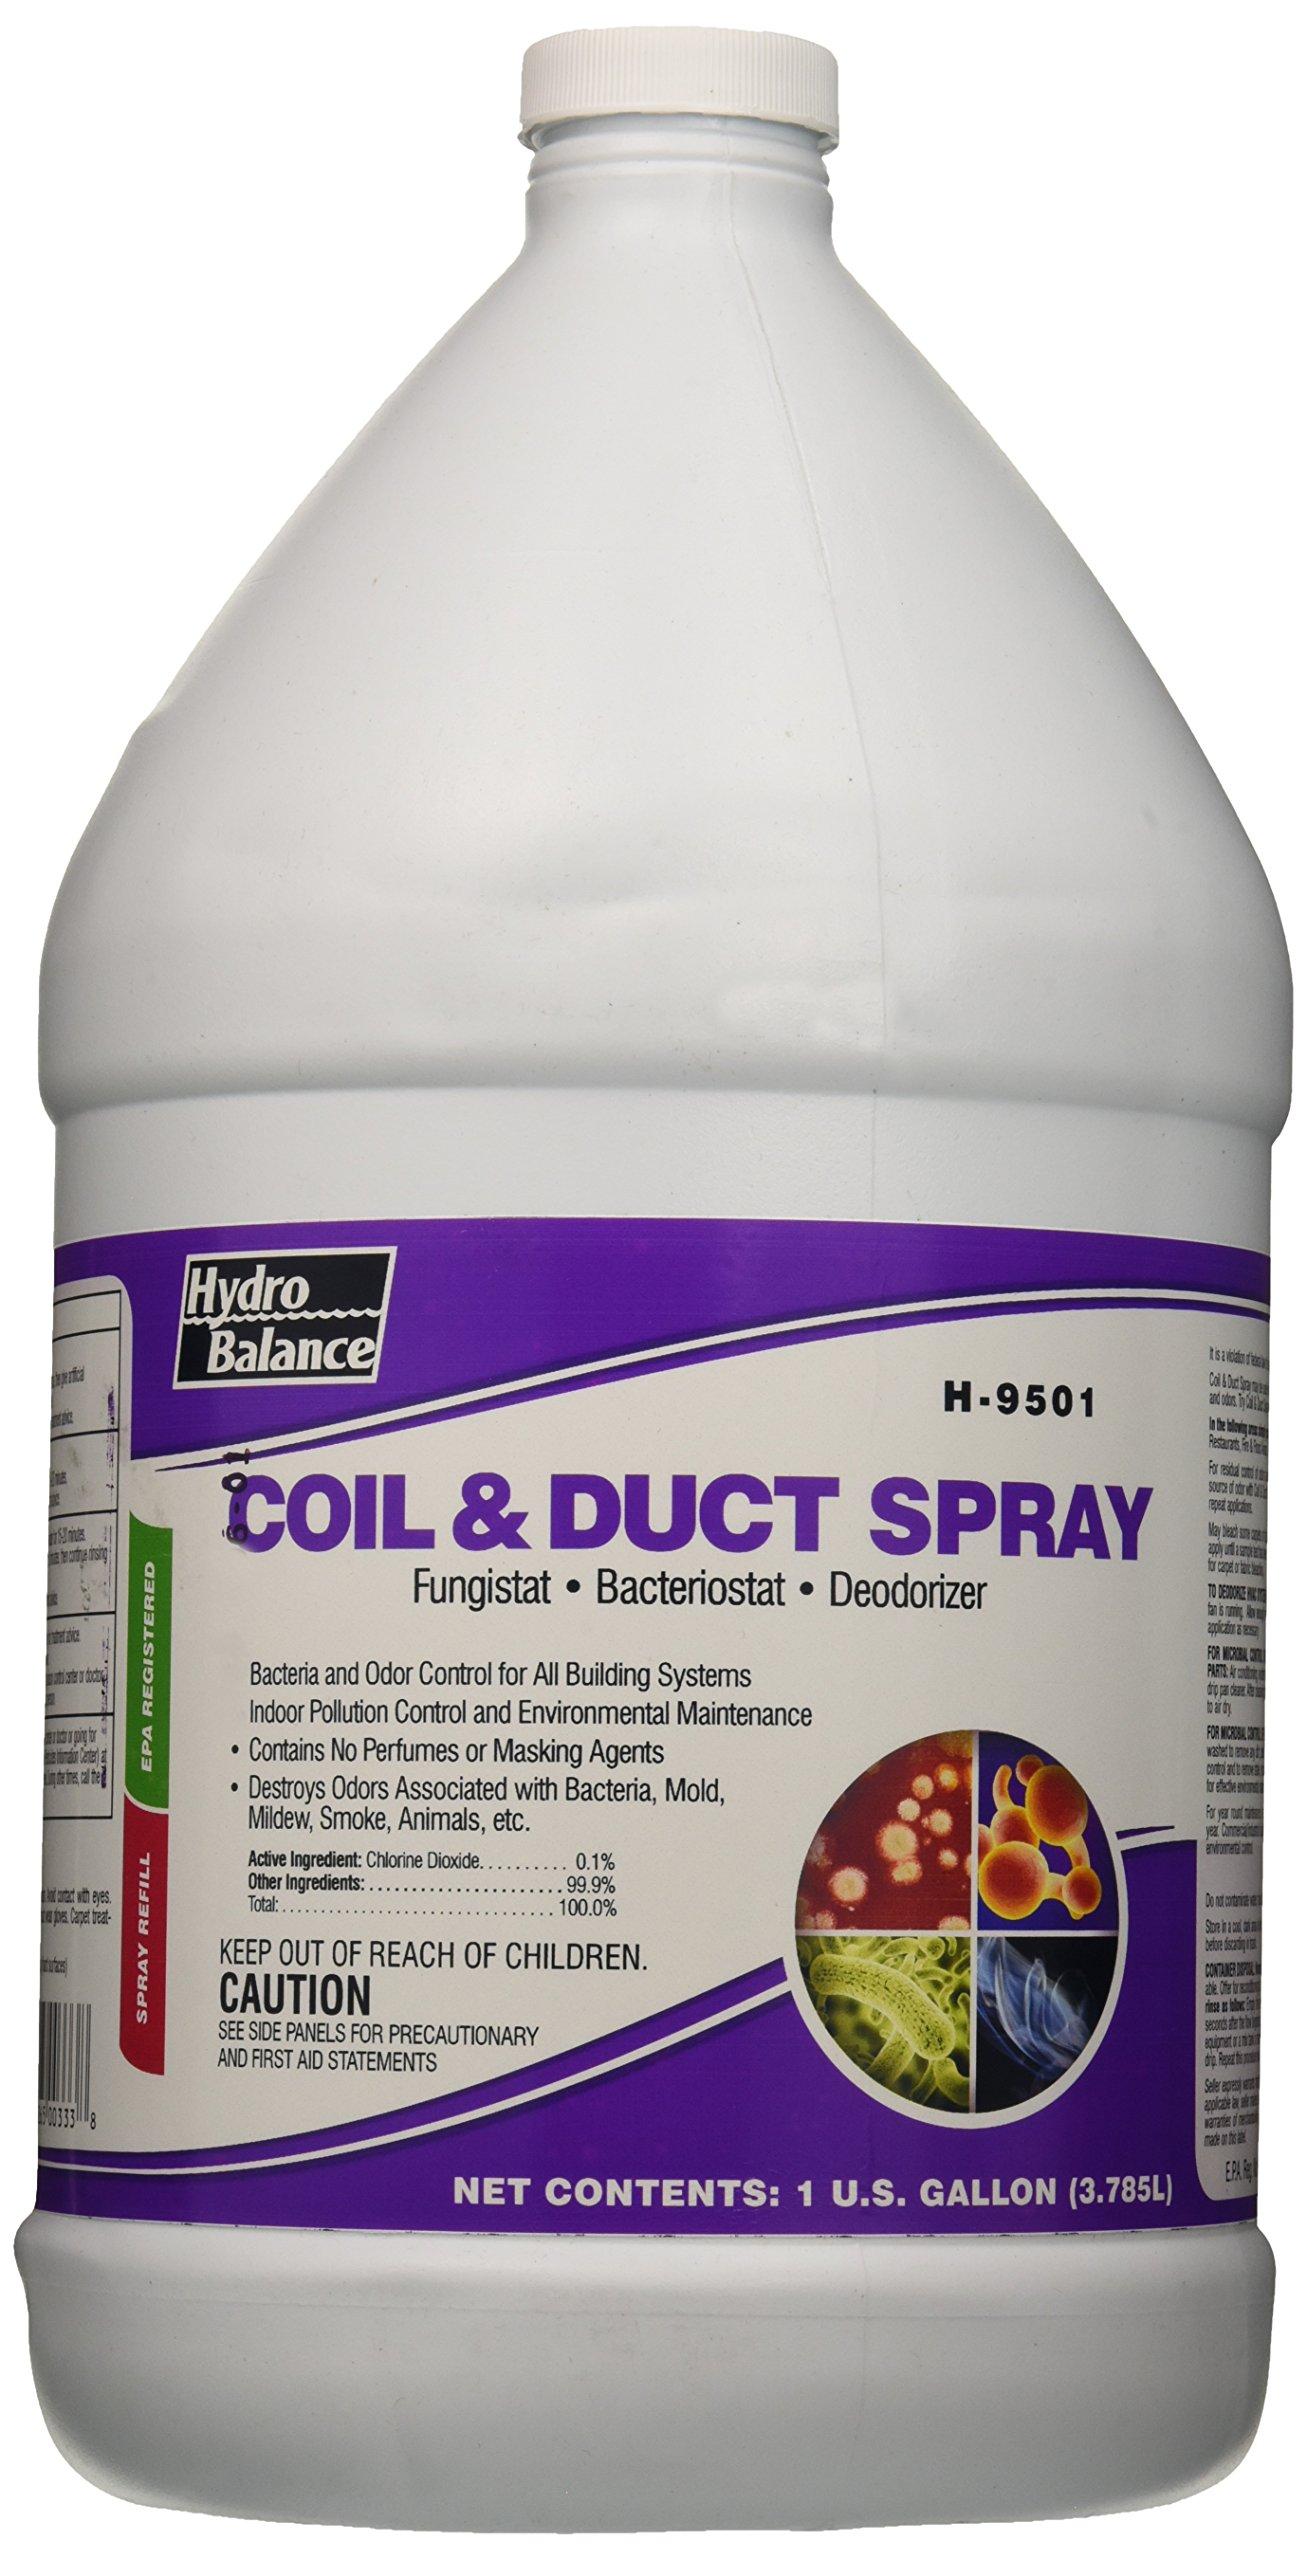 Rheem 9501 Hydro-Balance Coil and Duct Spray (Bottle), 1 gallon